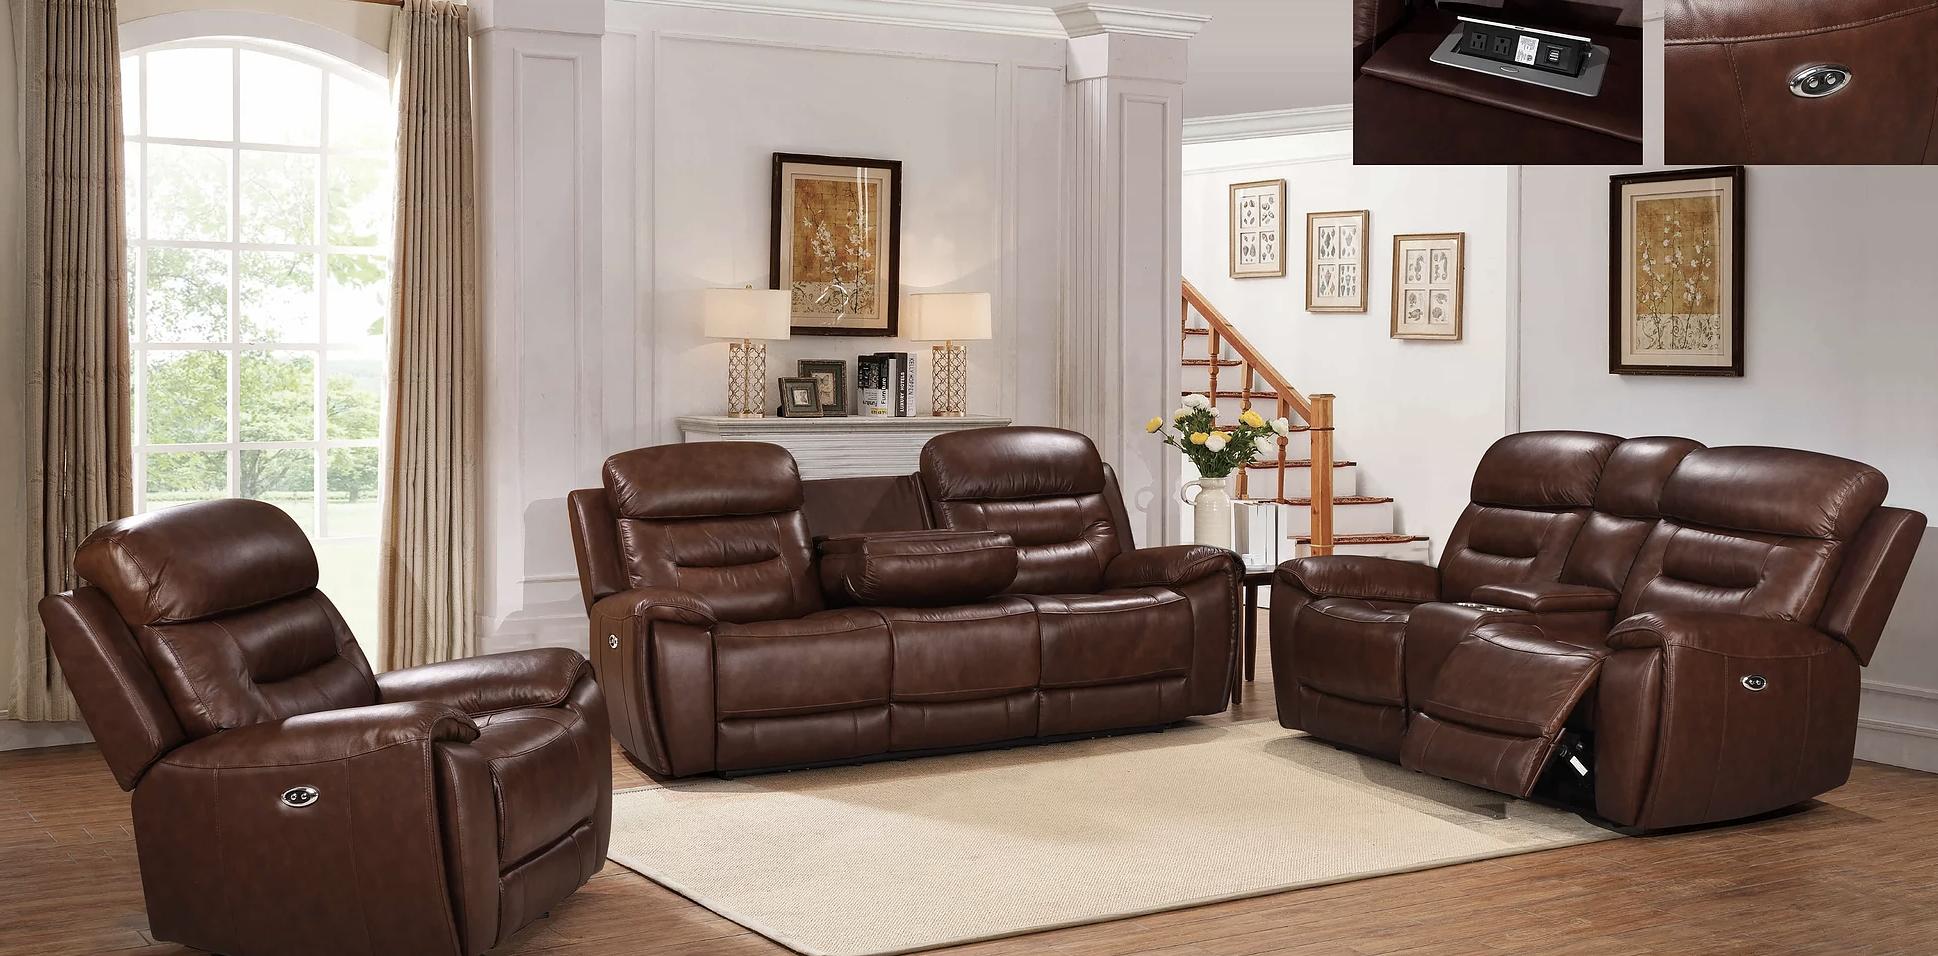 S2226 Rosewood Smartway Furniture